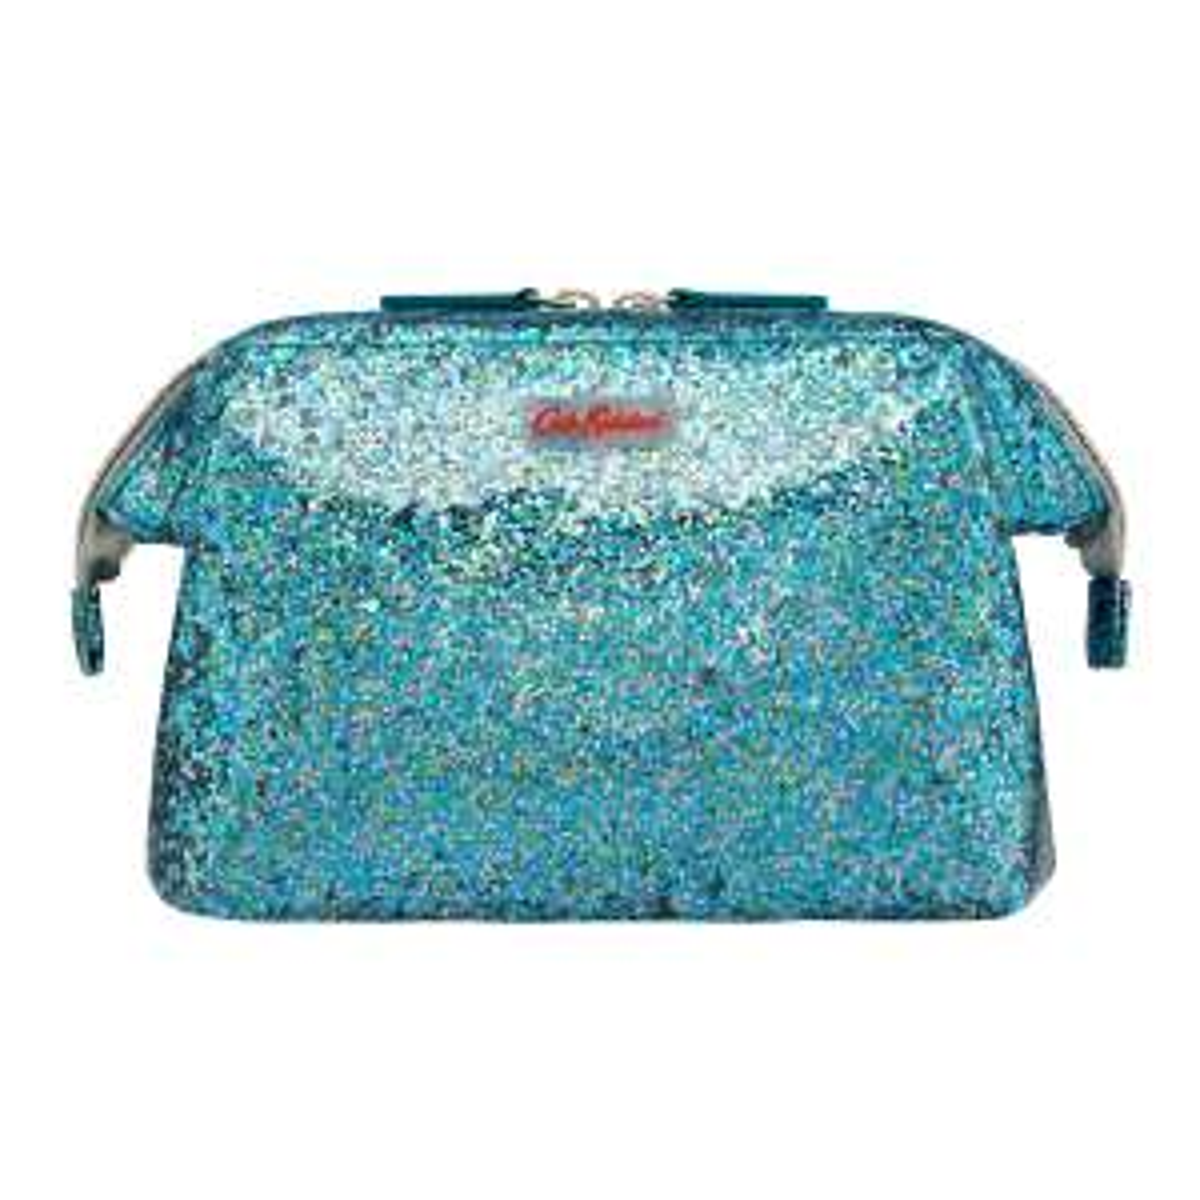 Cath Kidston glitter make up bag £7.20 (free C&C)